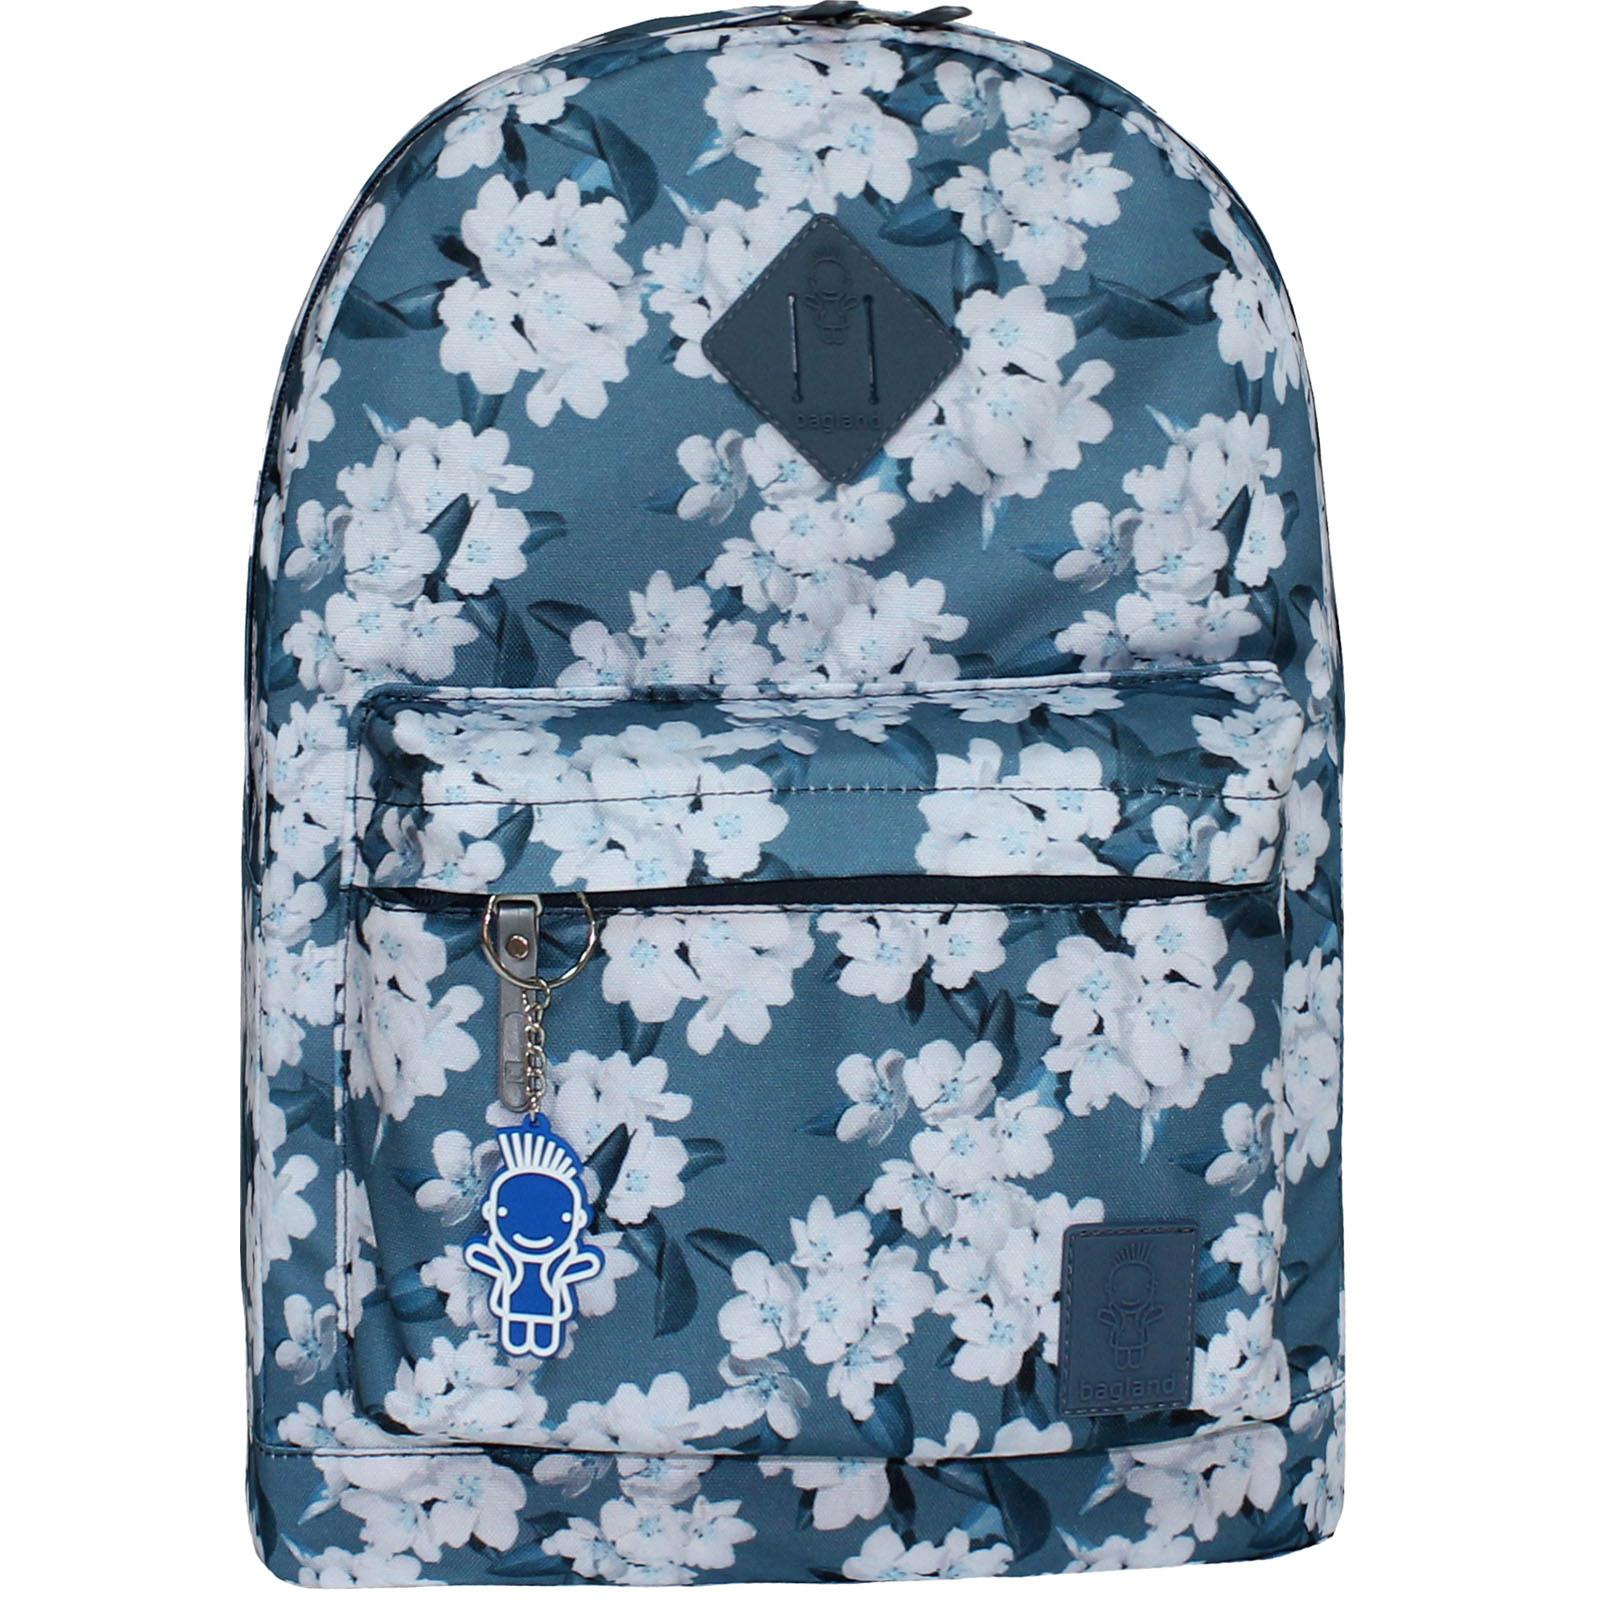 Городские рюкзаки Рюкзак Bagland Молодежный (дизайн) 17 л. сублимация 161 (00533664) IMG_7159_161.JPG